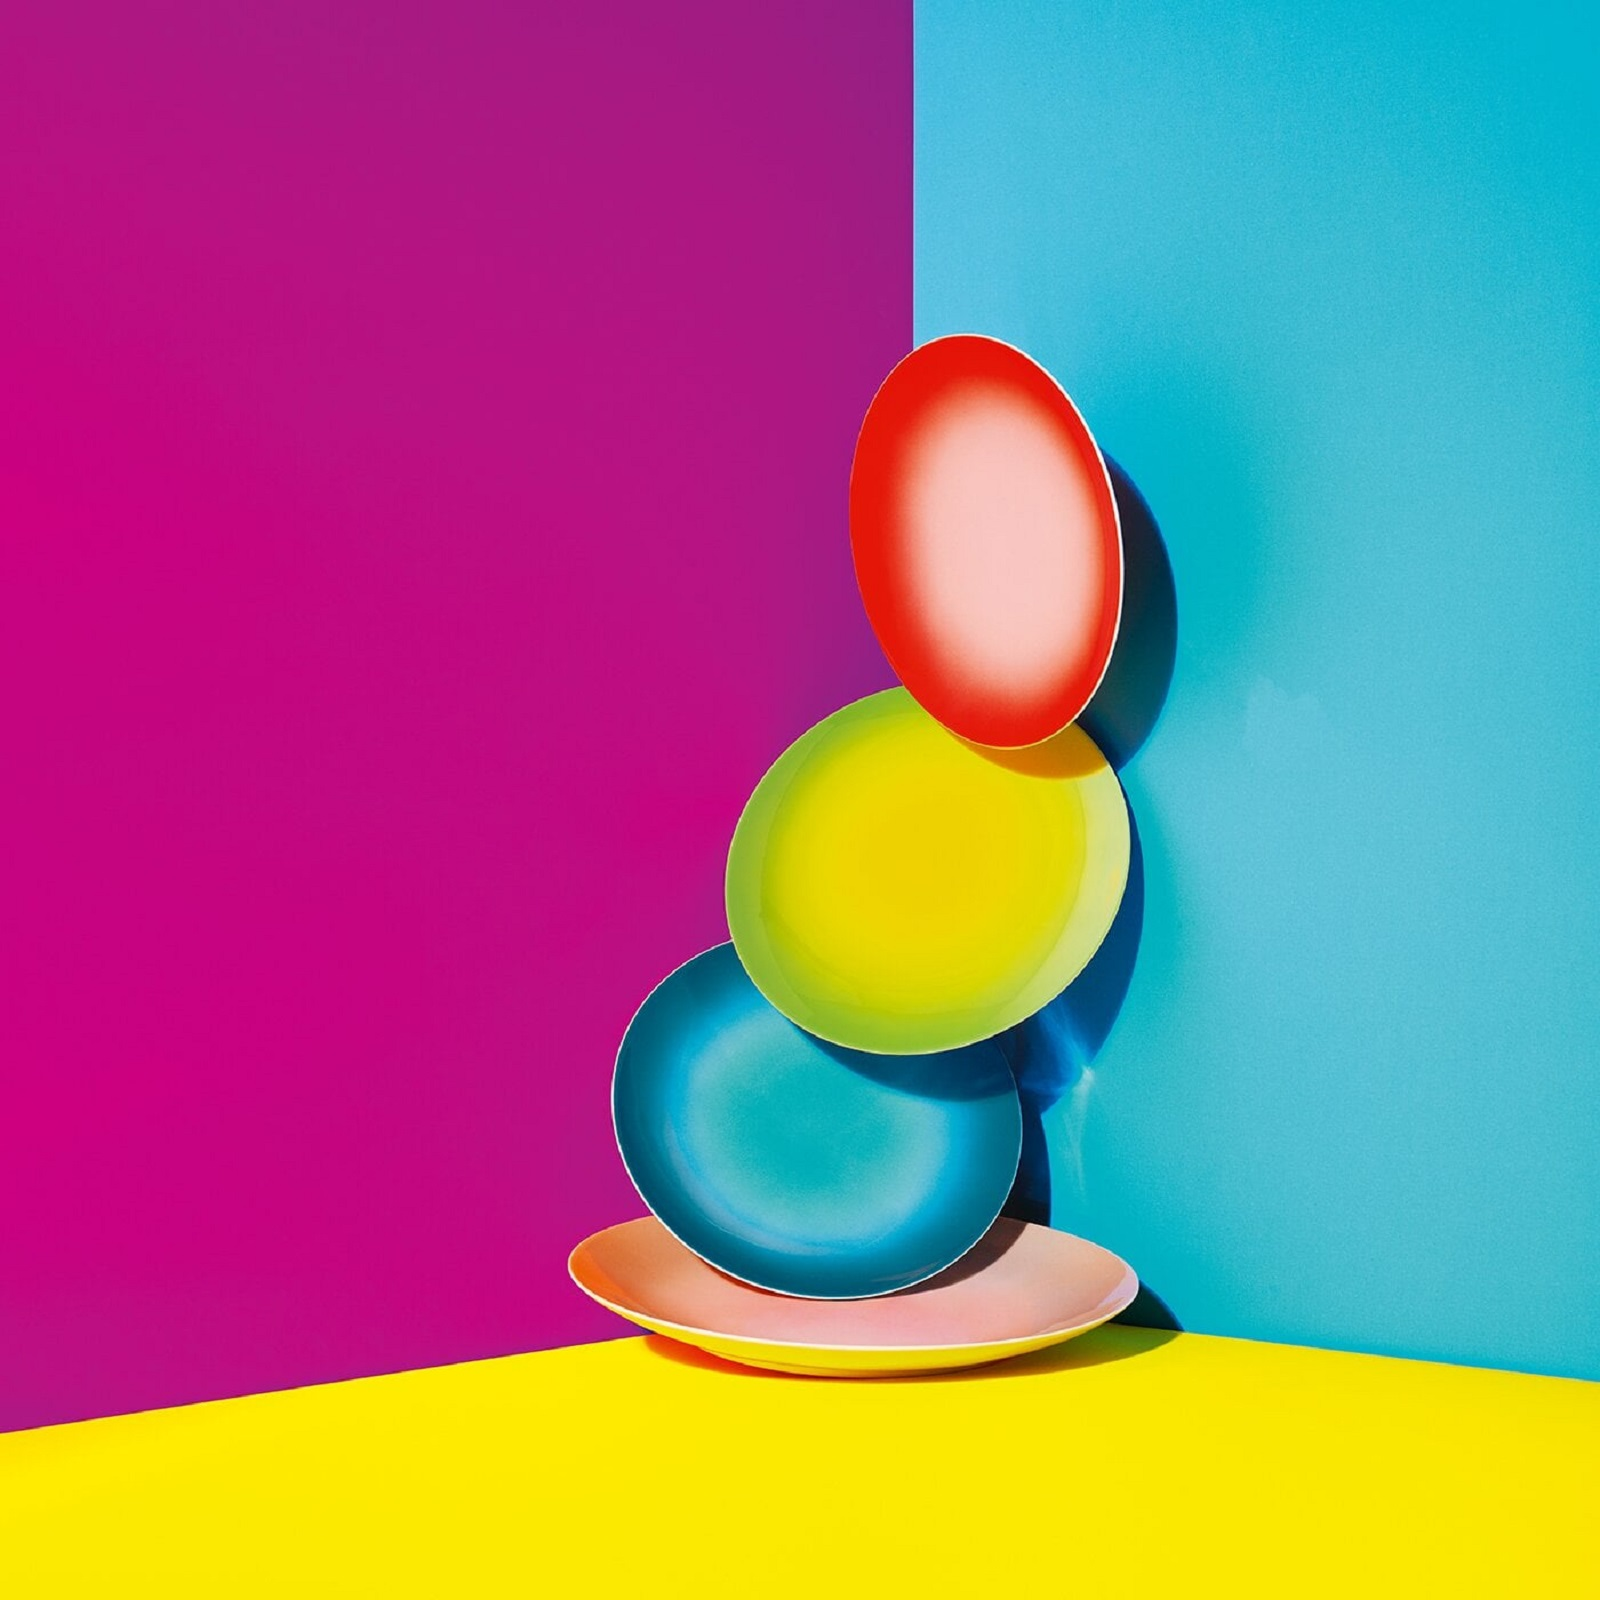 Тарелка глубокая фарфоровая Rosenthal Thomas BECOLOUR, диаметр 22 см, синий Rosenthal 10700-408729-10322 фото 2